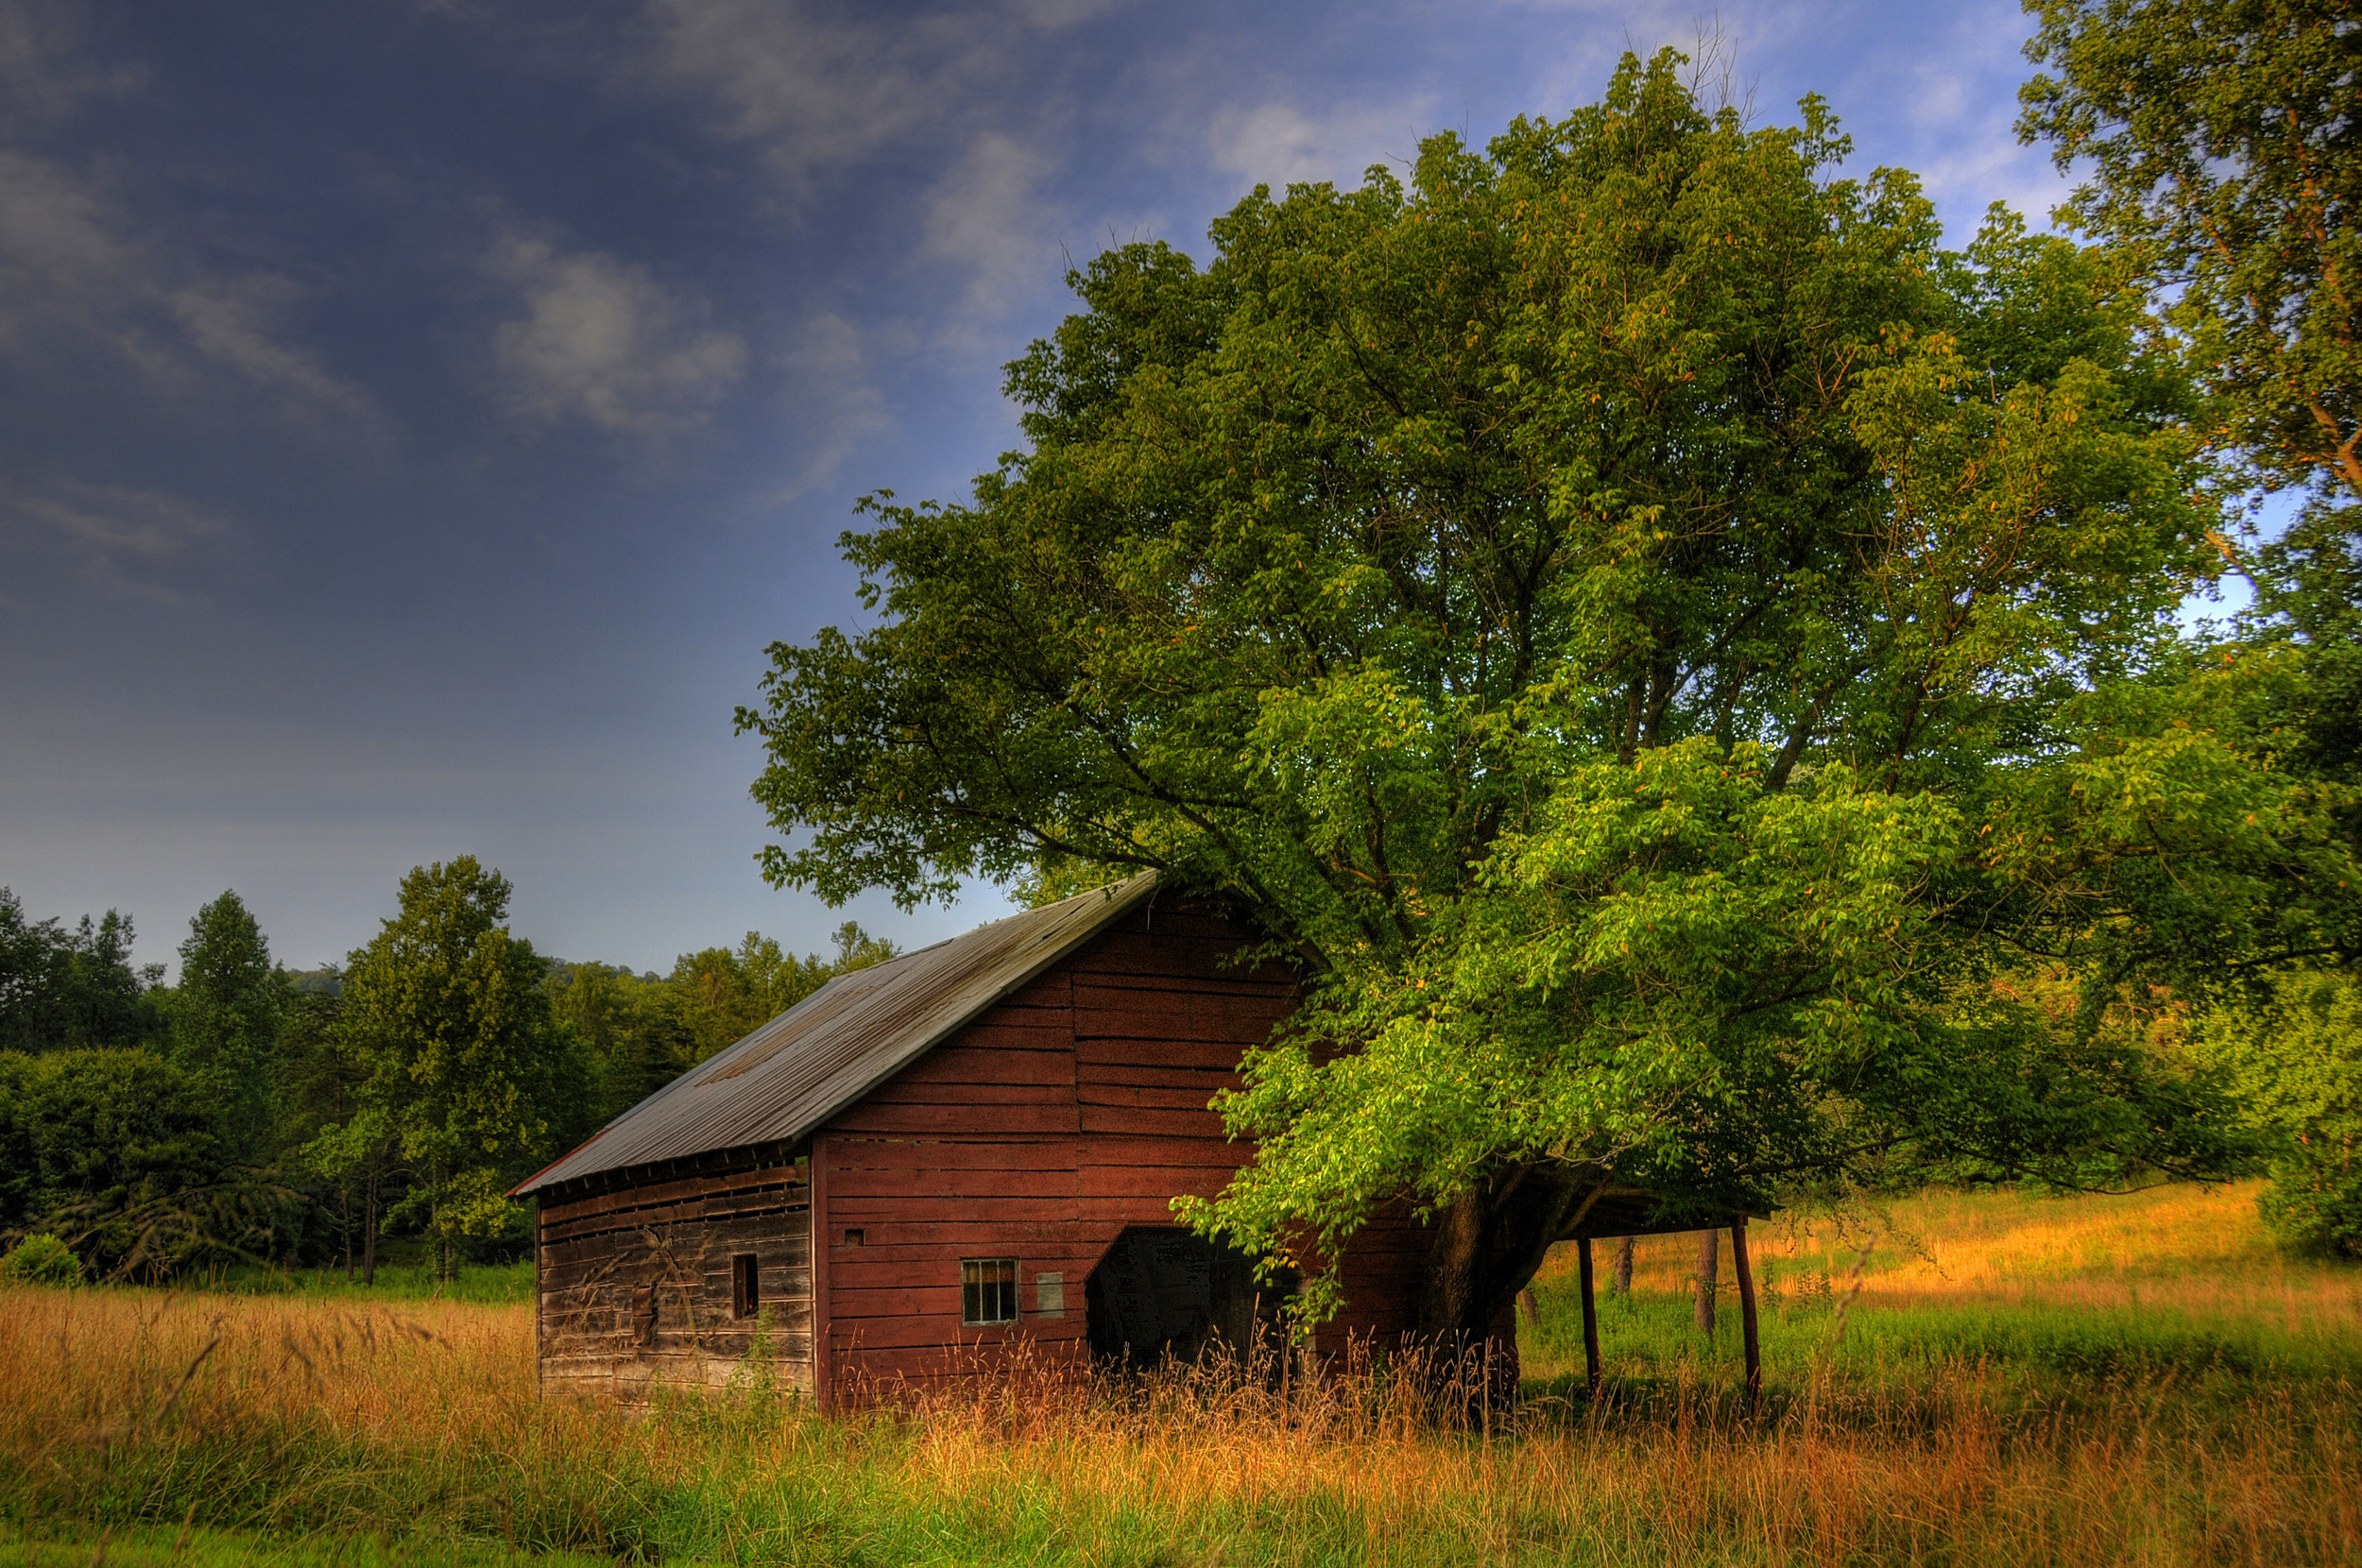 zForest view barn1.jpg